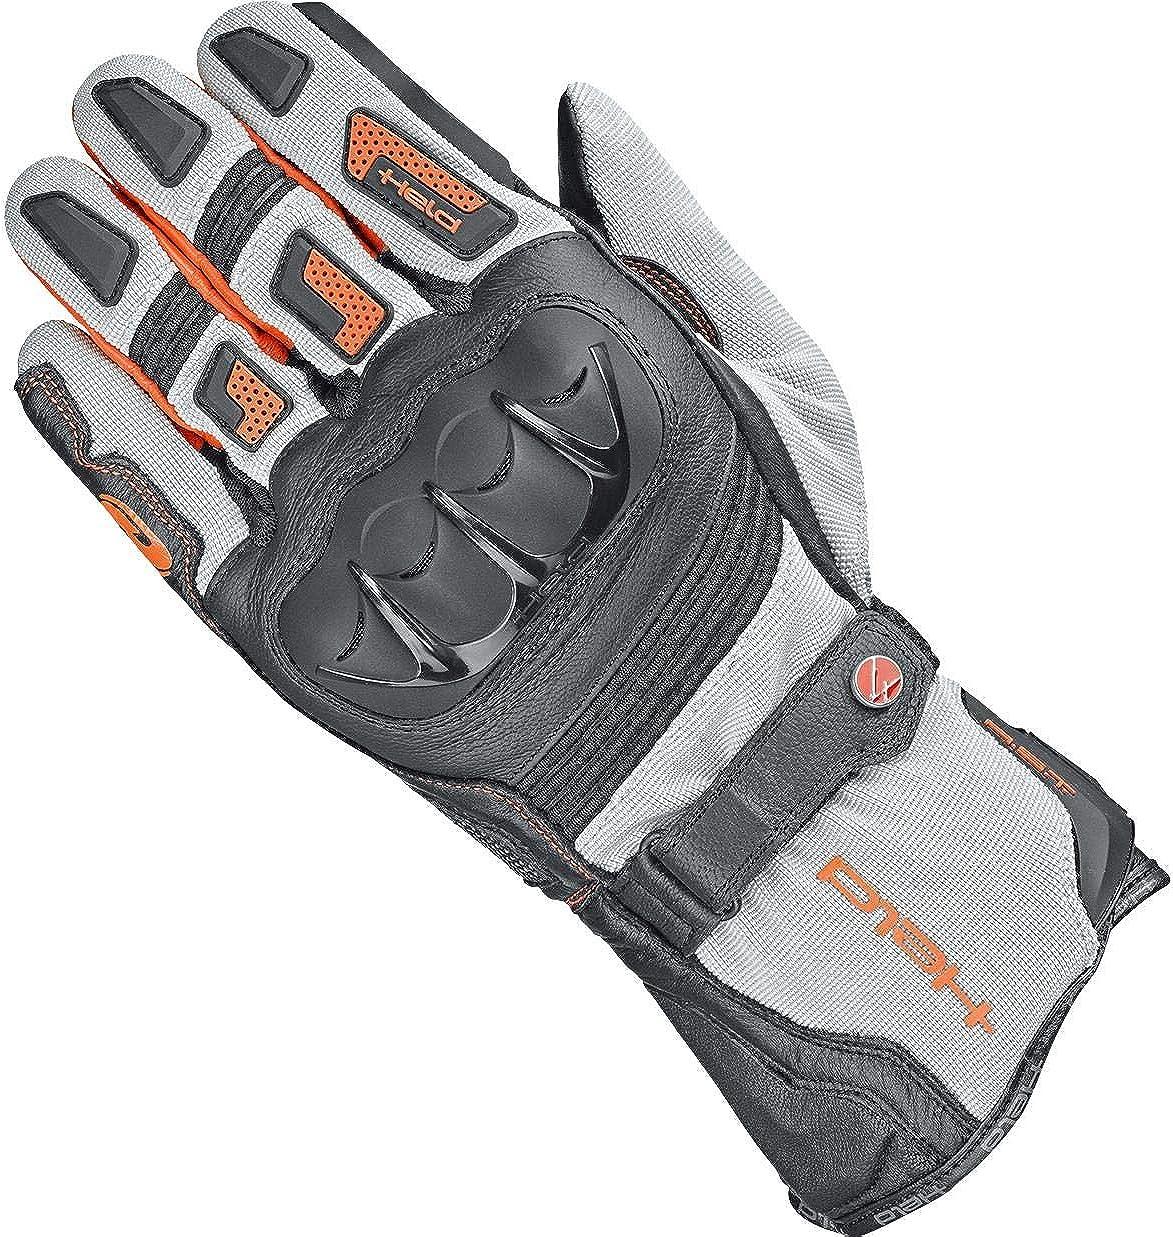 Held Motorradhandschuhe kurz Motorrad Handschuh Sambia 2in1 Gore-Tex/® Handschuh Enduro//Reiseenduro Herren Ganzj/ährig Leder//Textil